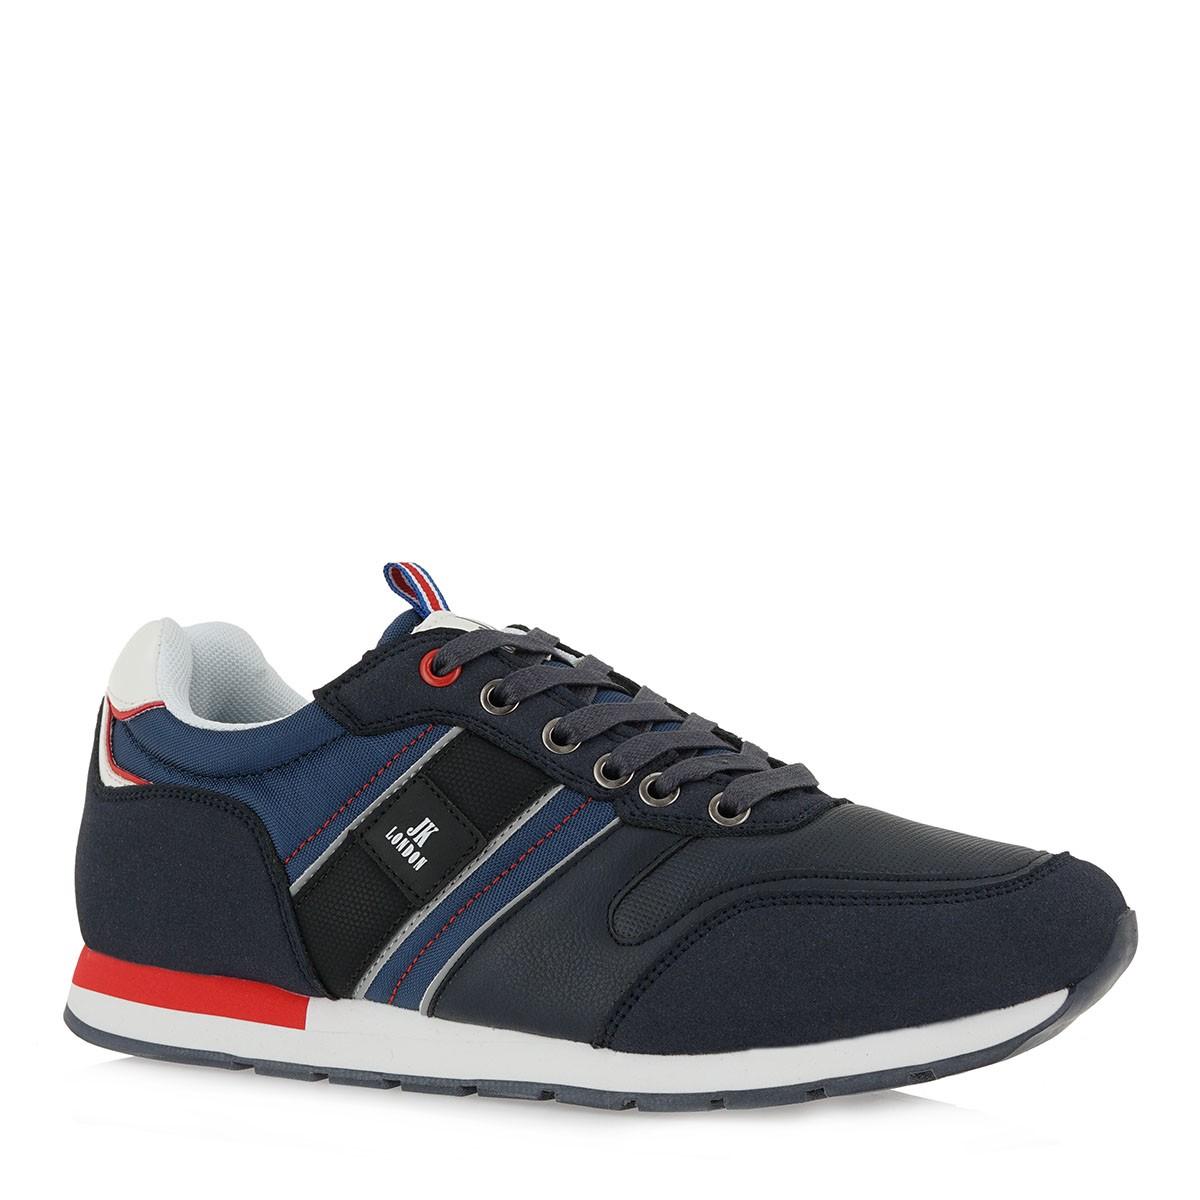 JK LONDON Ανδρικά παπούτσια Sneakers 044-905044Α Μπλέ Καστόρι K585X0441A50